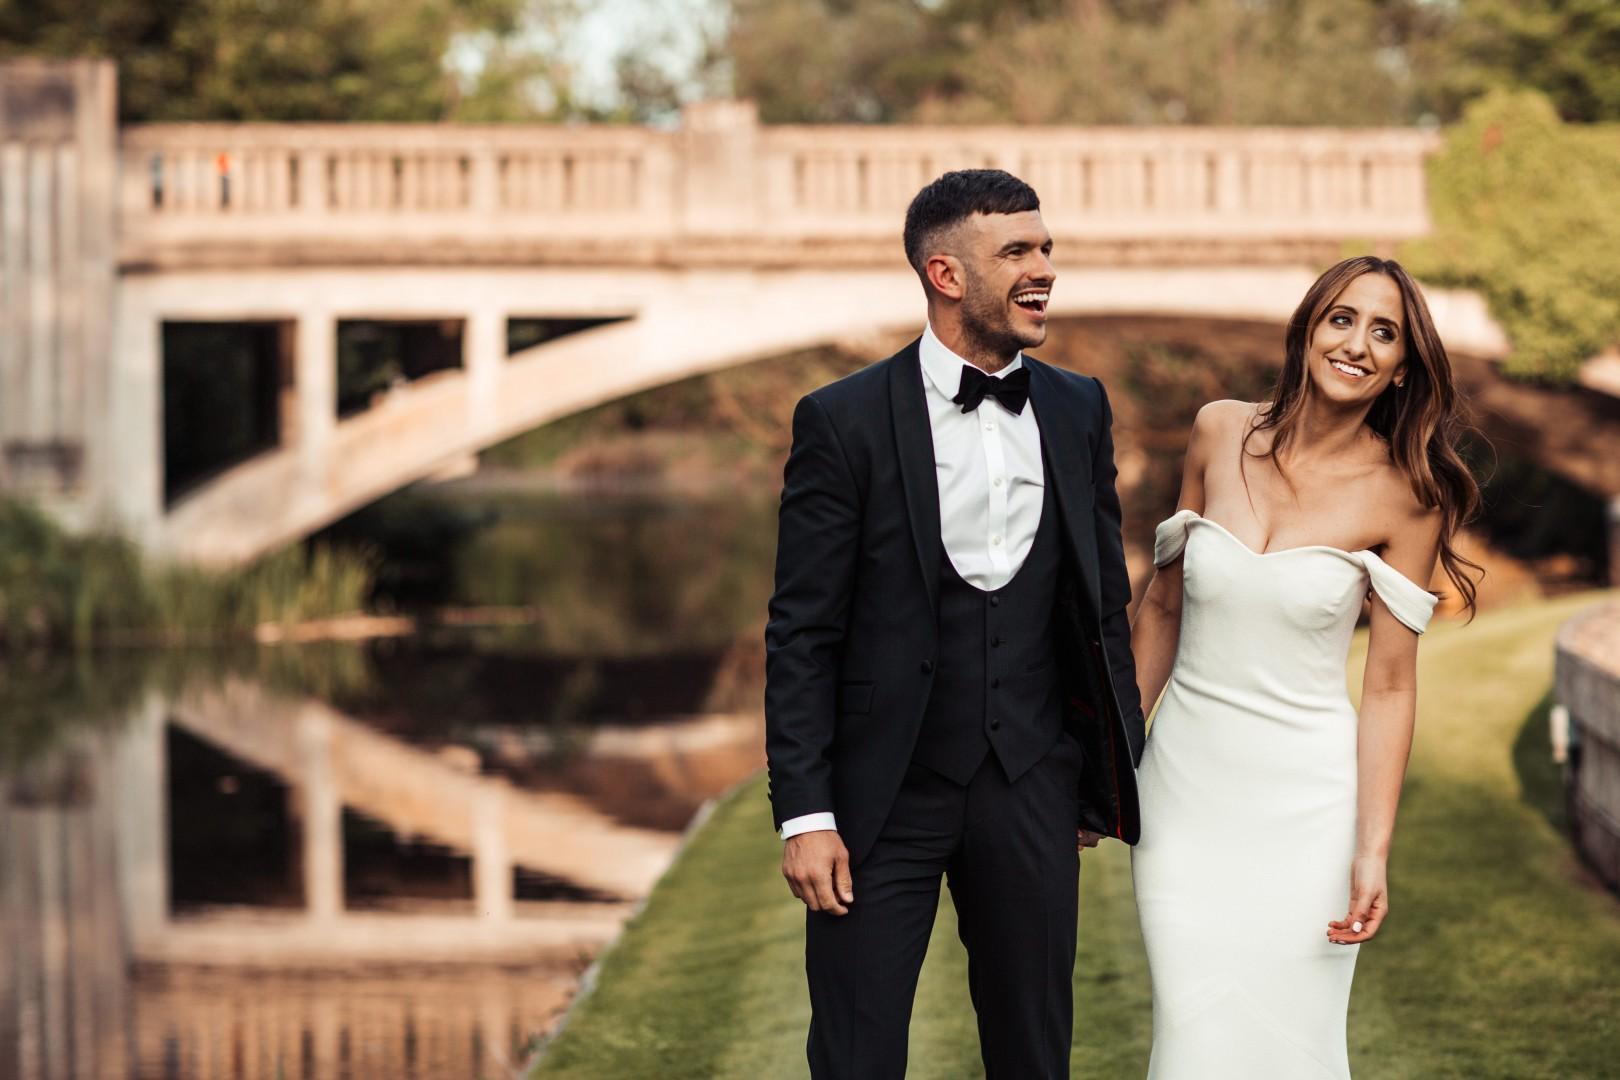 Milsom Weddings, Spring Open Days in Essex and Suffolk 2020